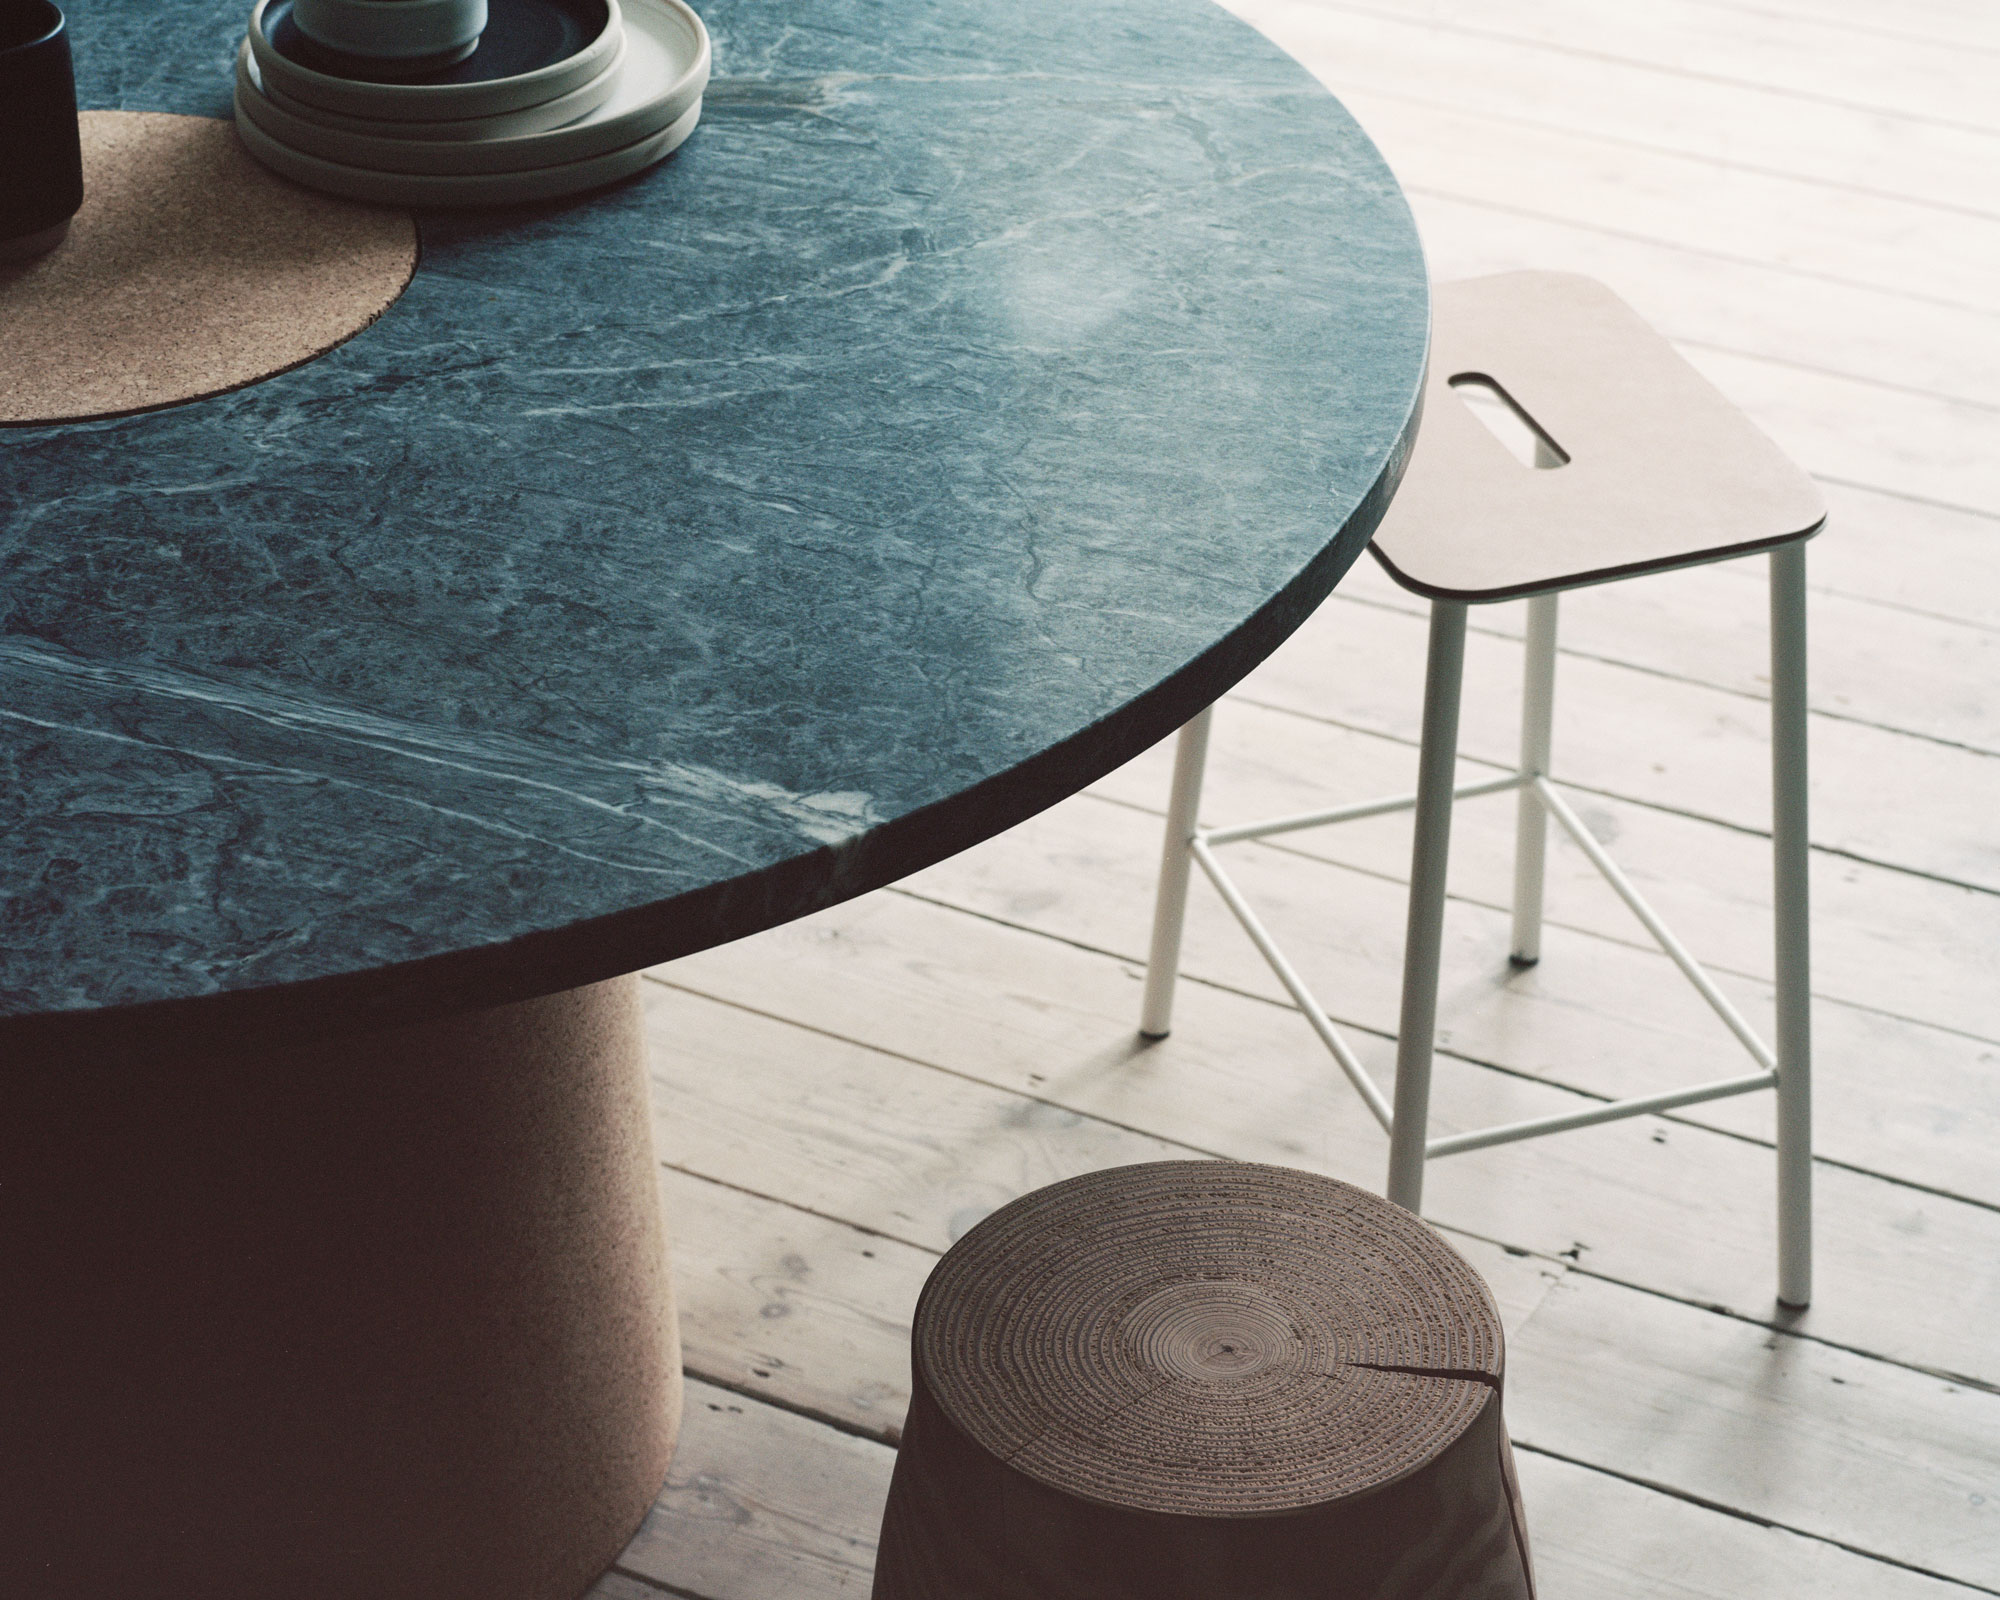 House_of_Grey_Exhibition_cork_pedestal_table_texture.jpg